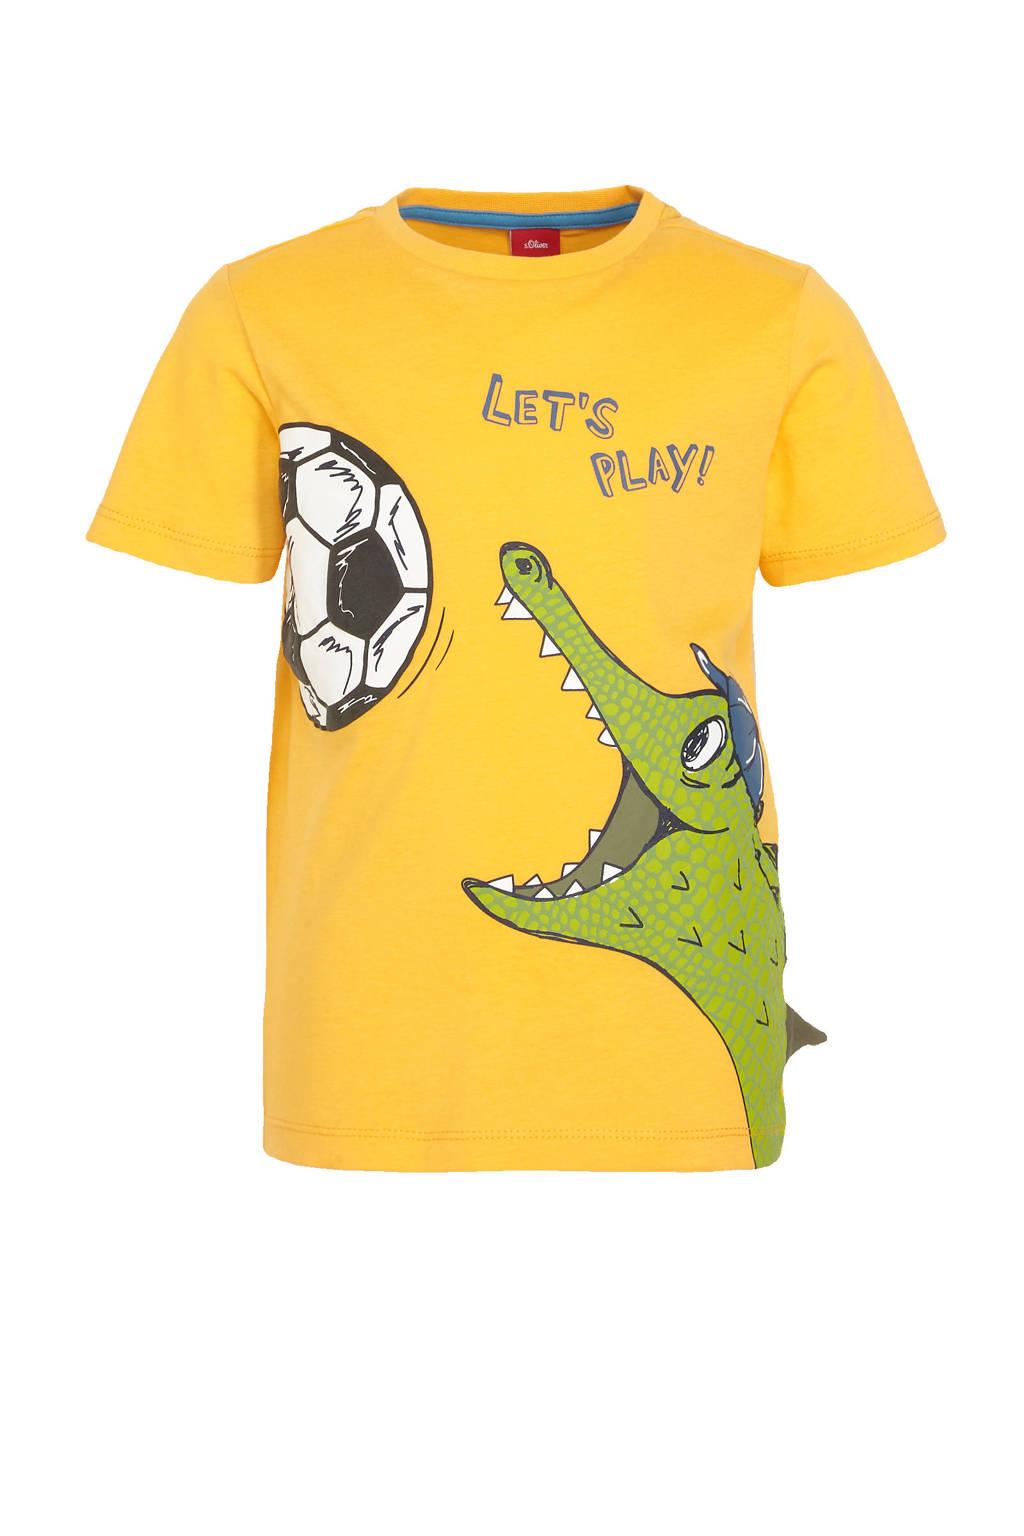 s.Oliver T-shirt met dierenprint geel/groen, Geel/groen